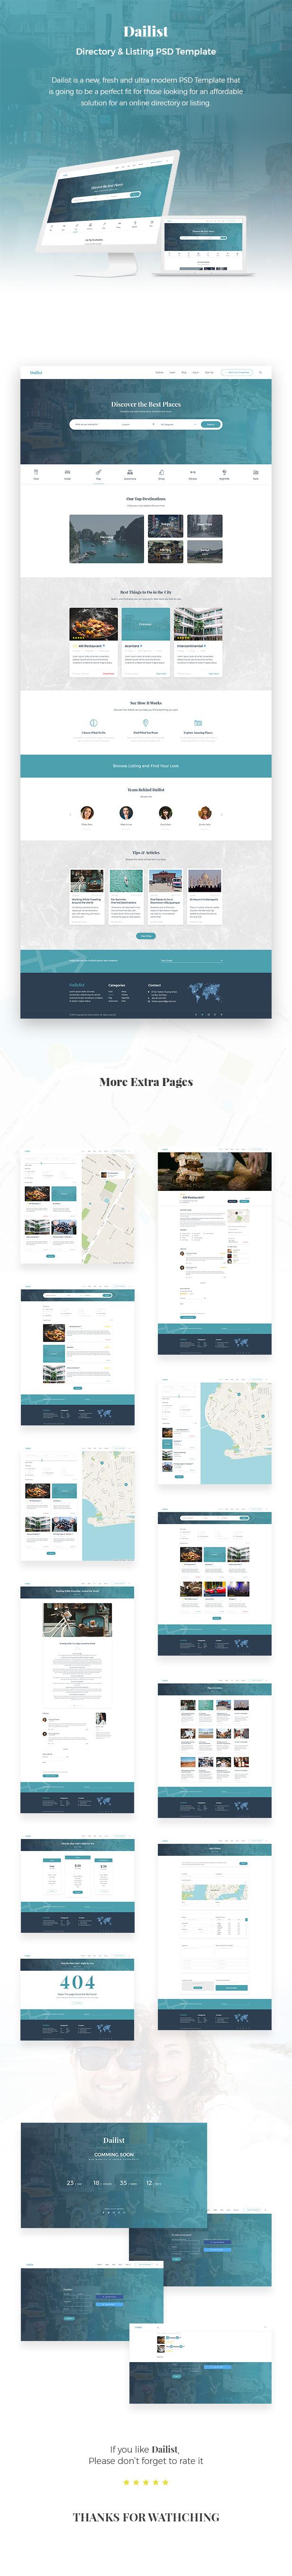 Dailist - Directory & Listing PSD Template - 1